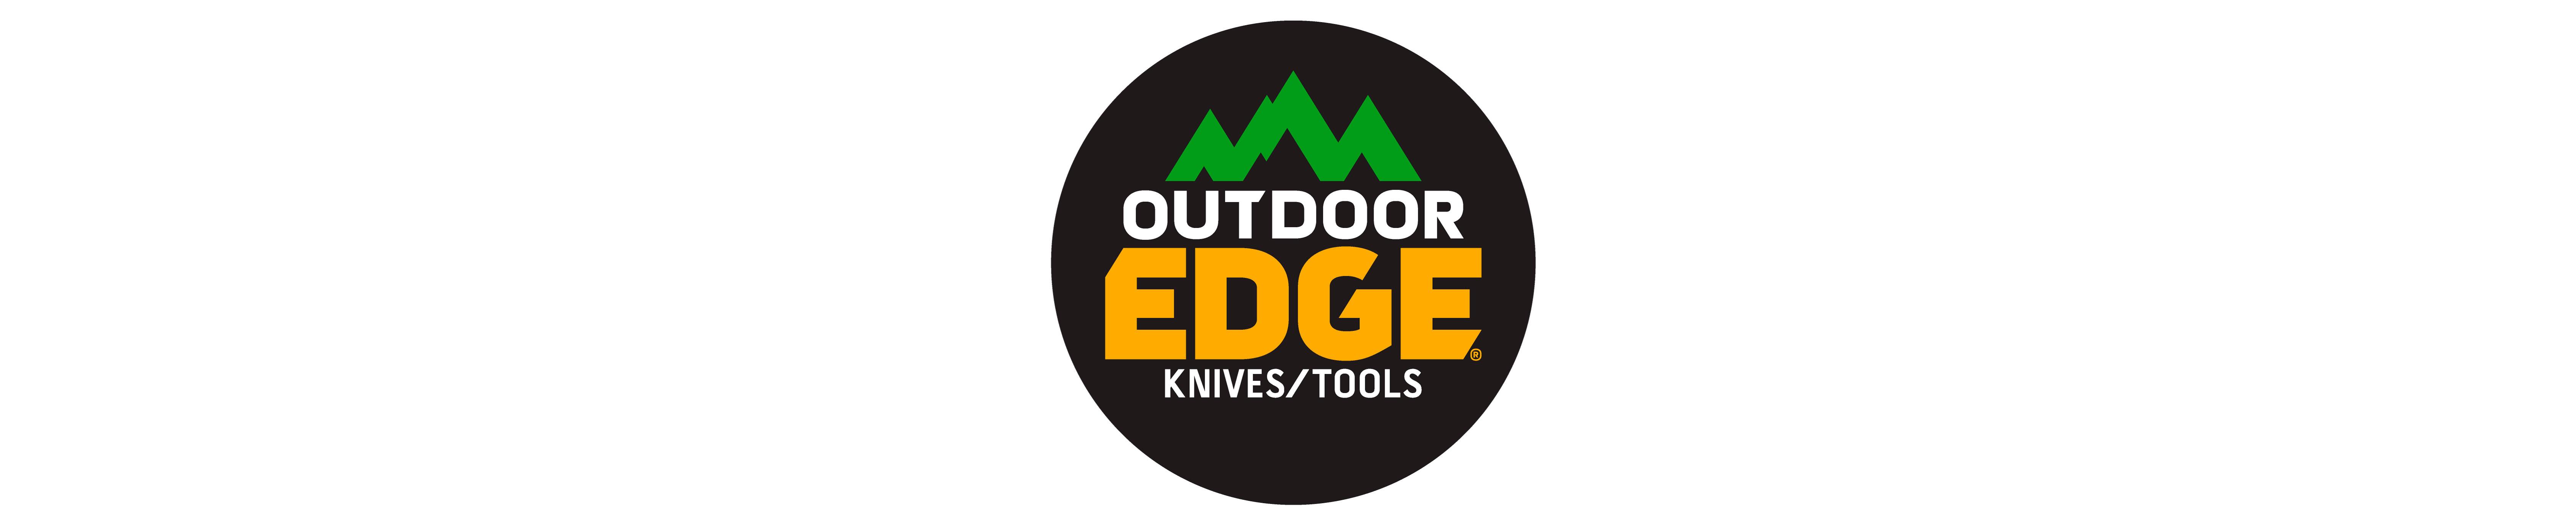 Outdoor-Edge